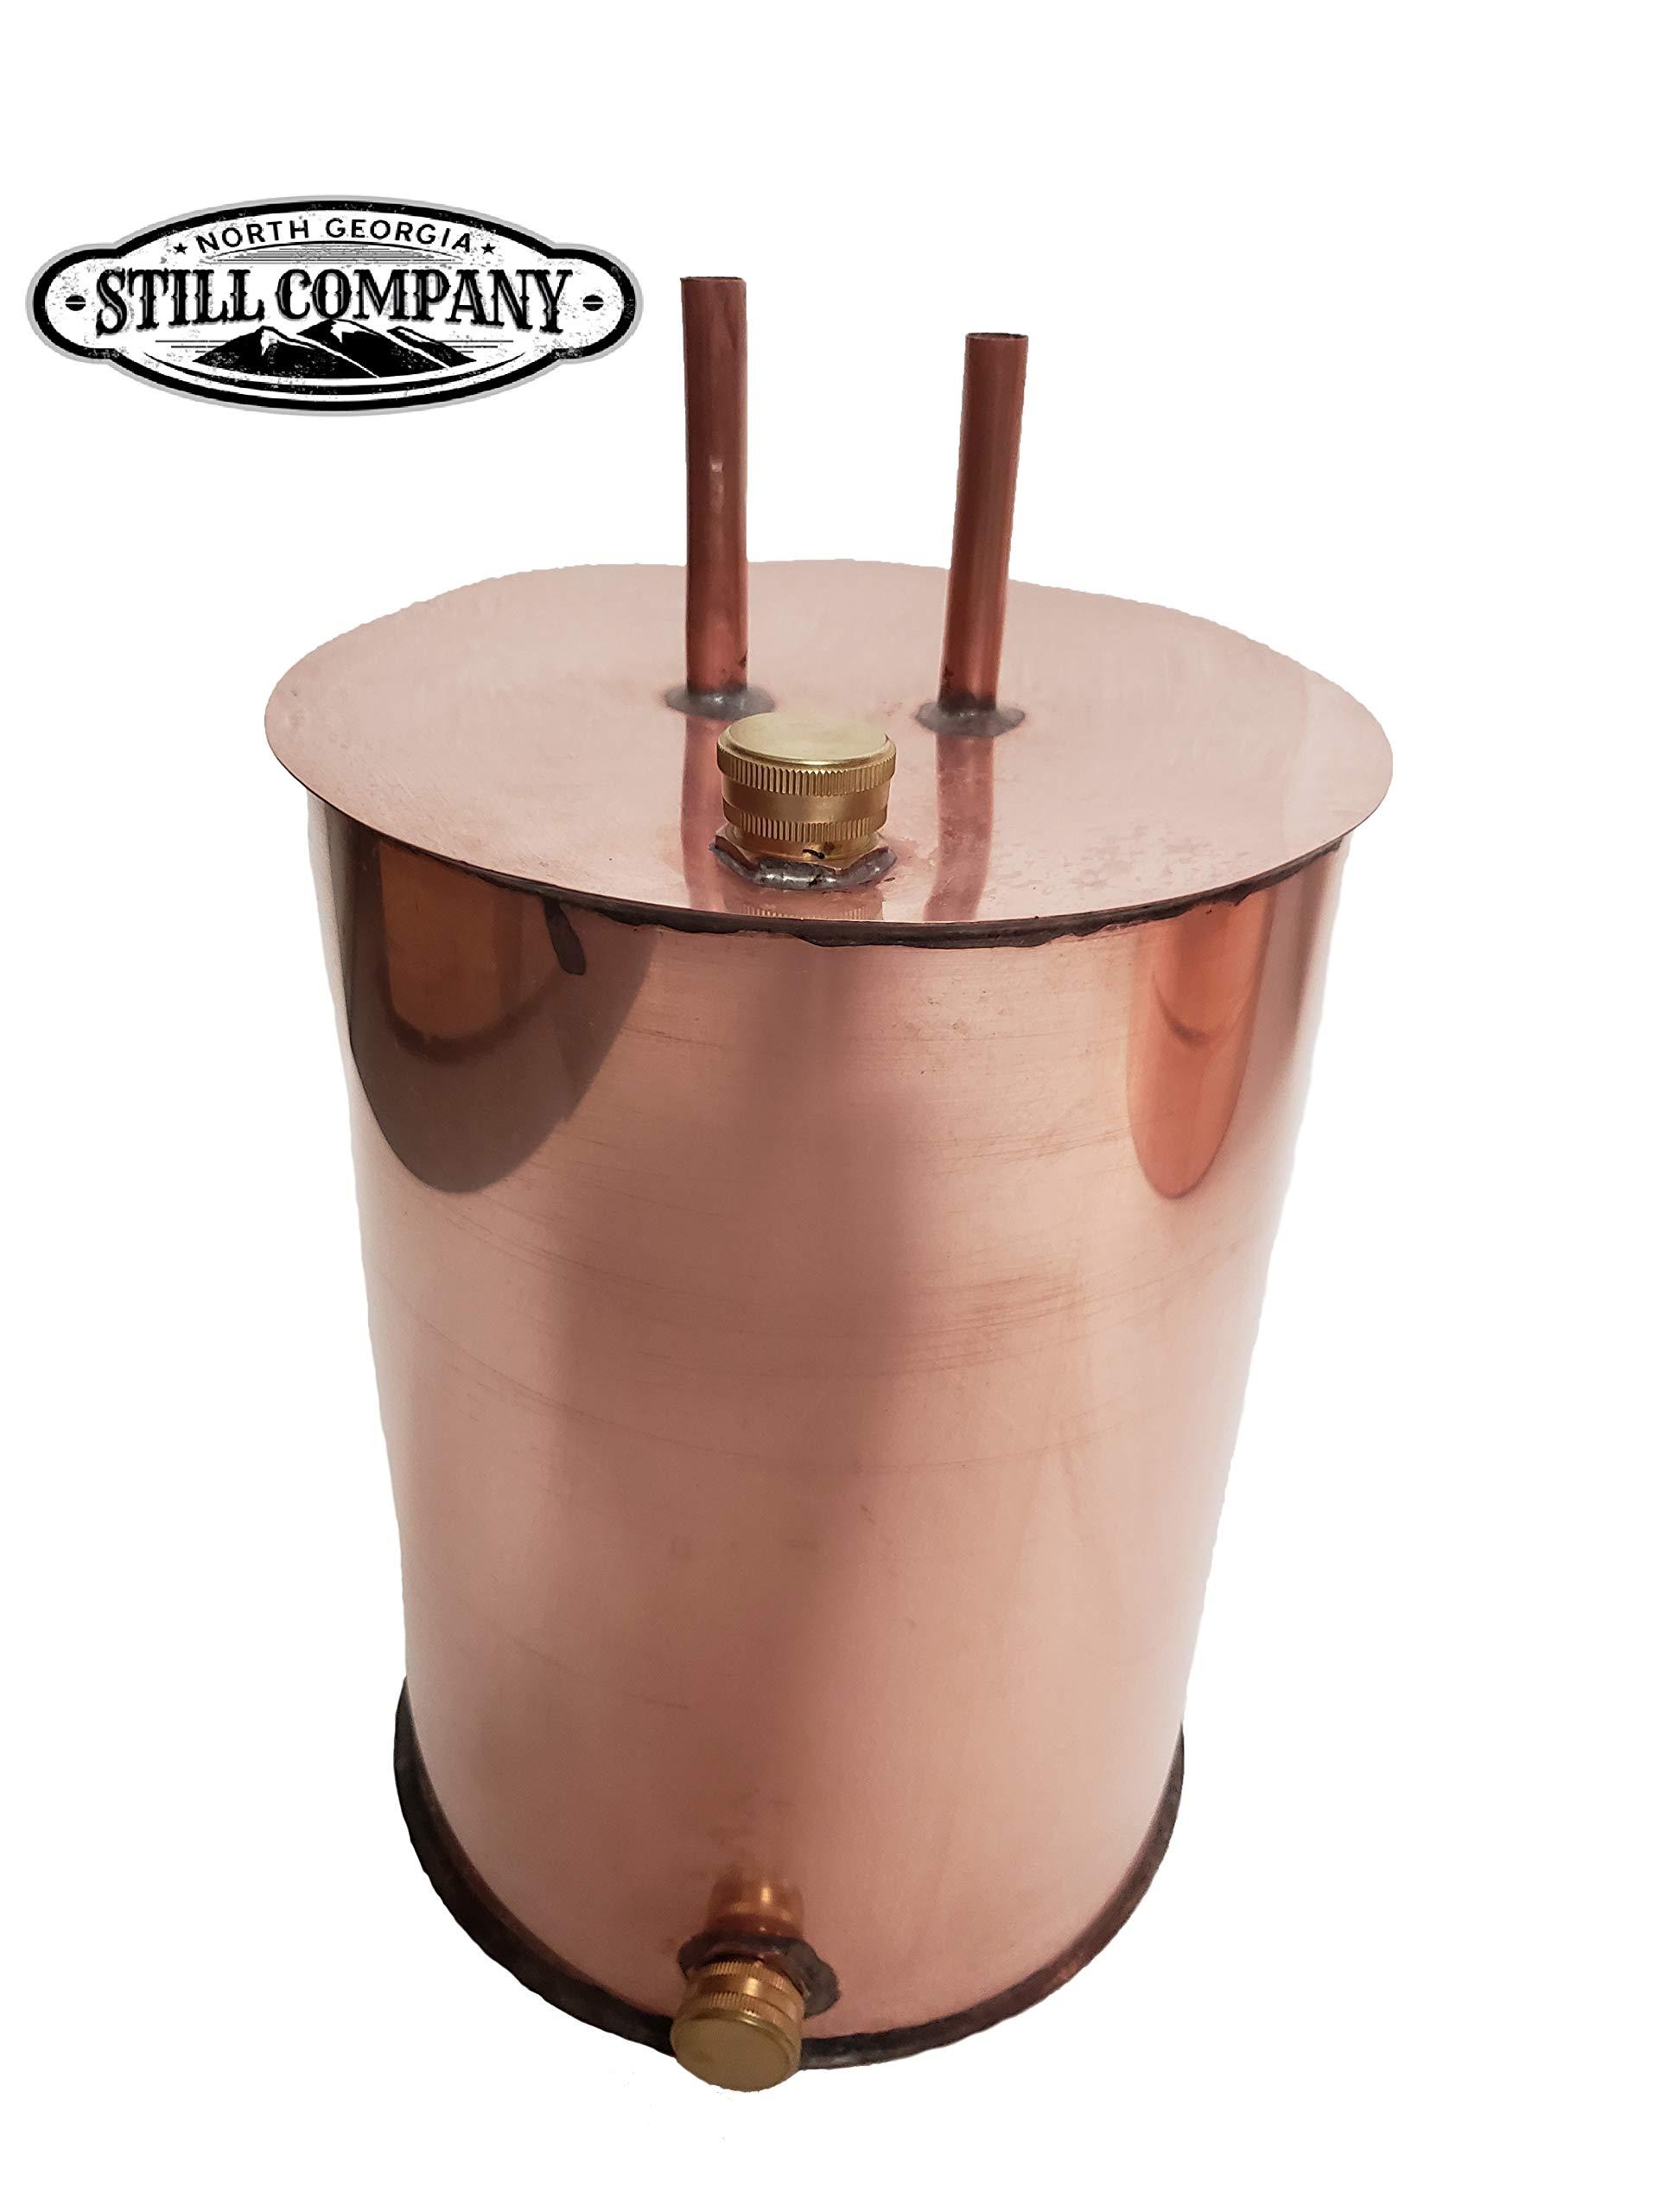 Moonshine Whiskey Still 3 Gallon Thumper Keg Doubler, 1/2 OD Tubing by North Georgia Still Company